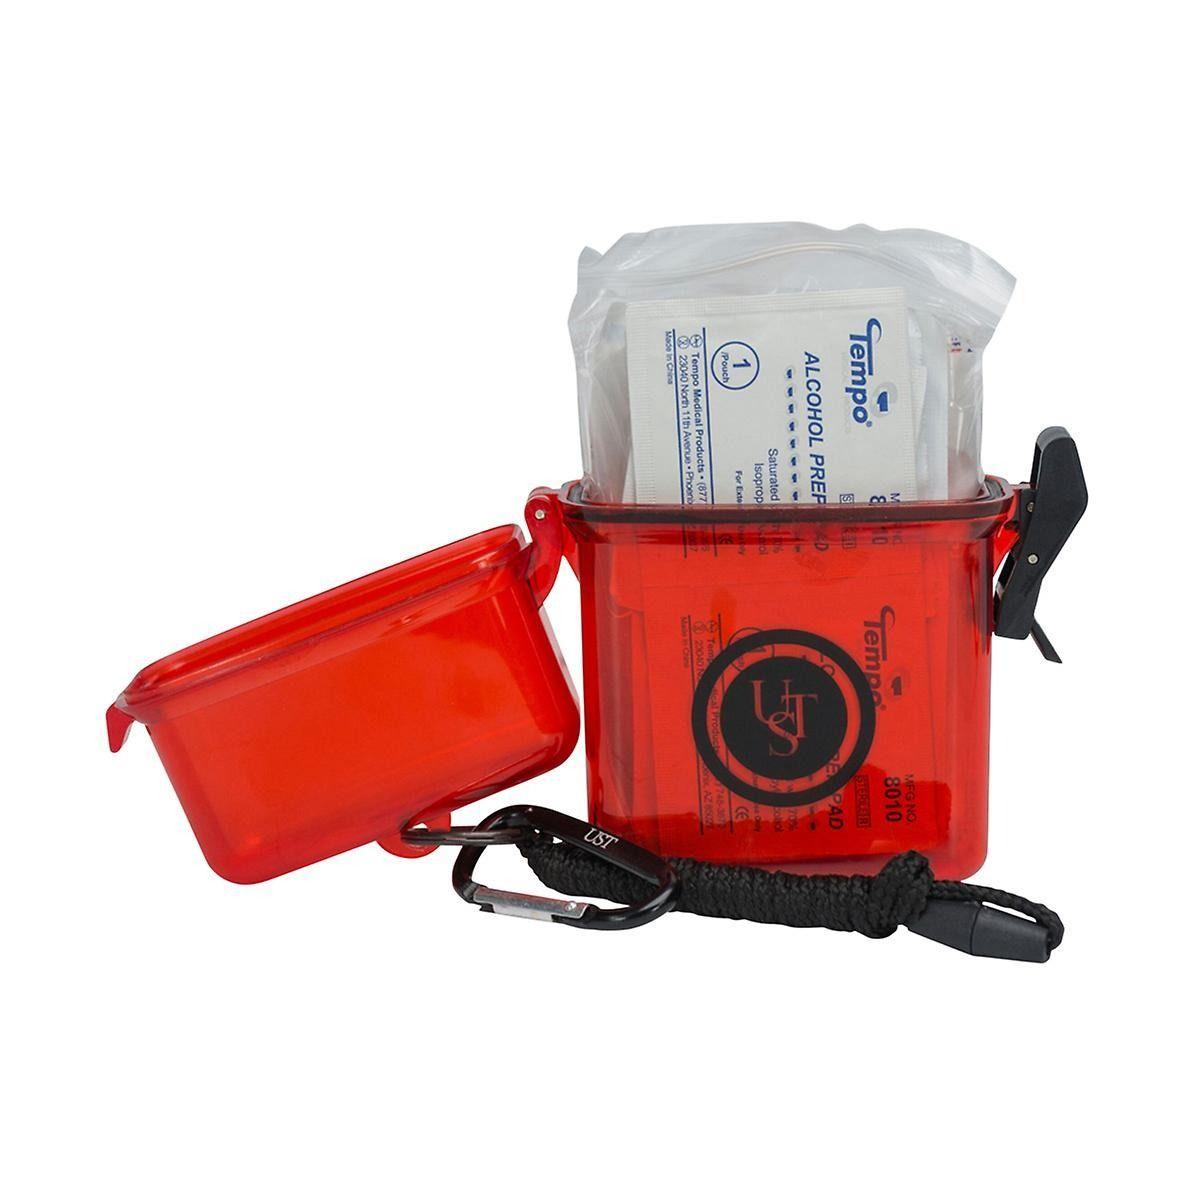 Watertight First Aid Kit First Aid Kit Car Trunk Organization Emergency Sewing Kit